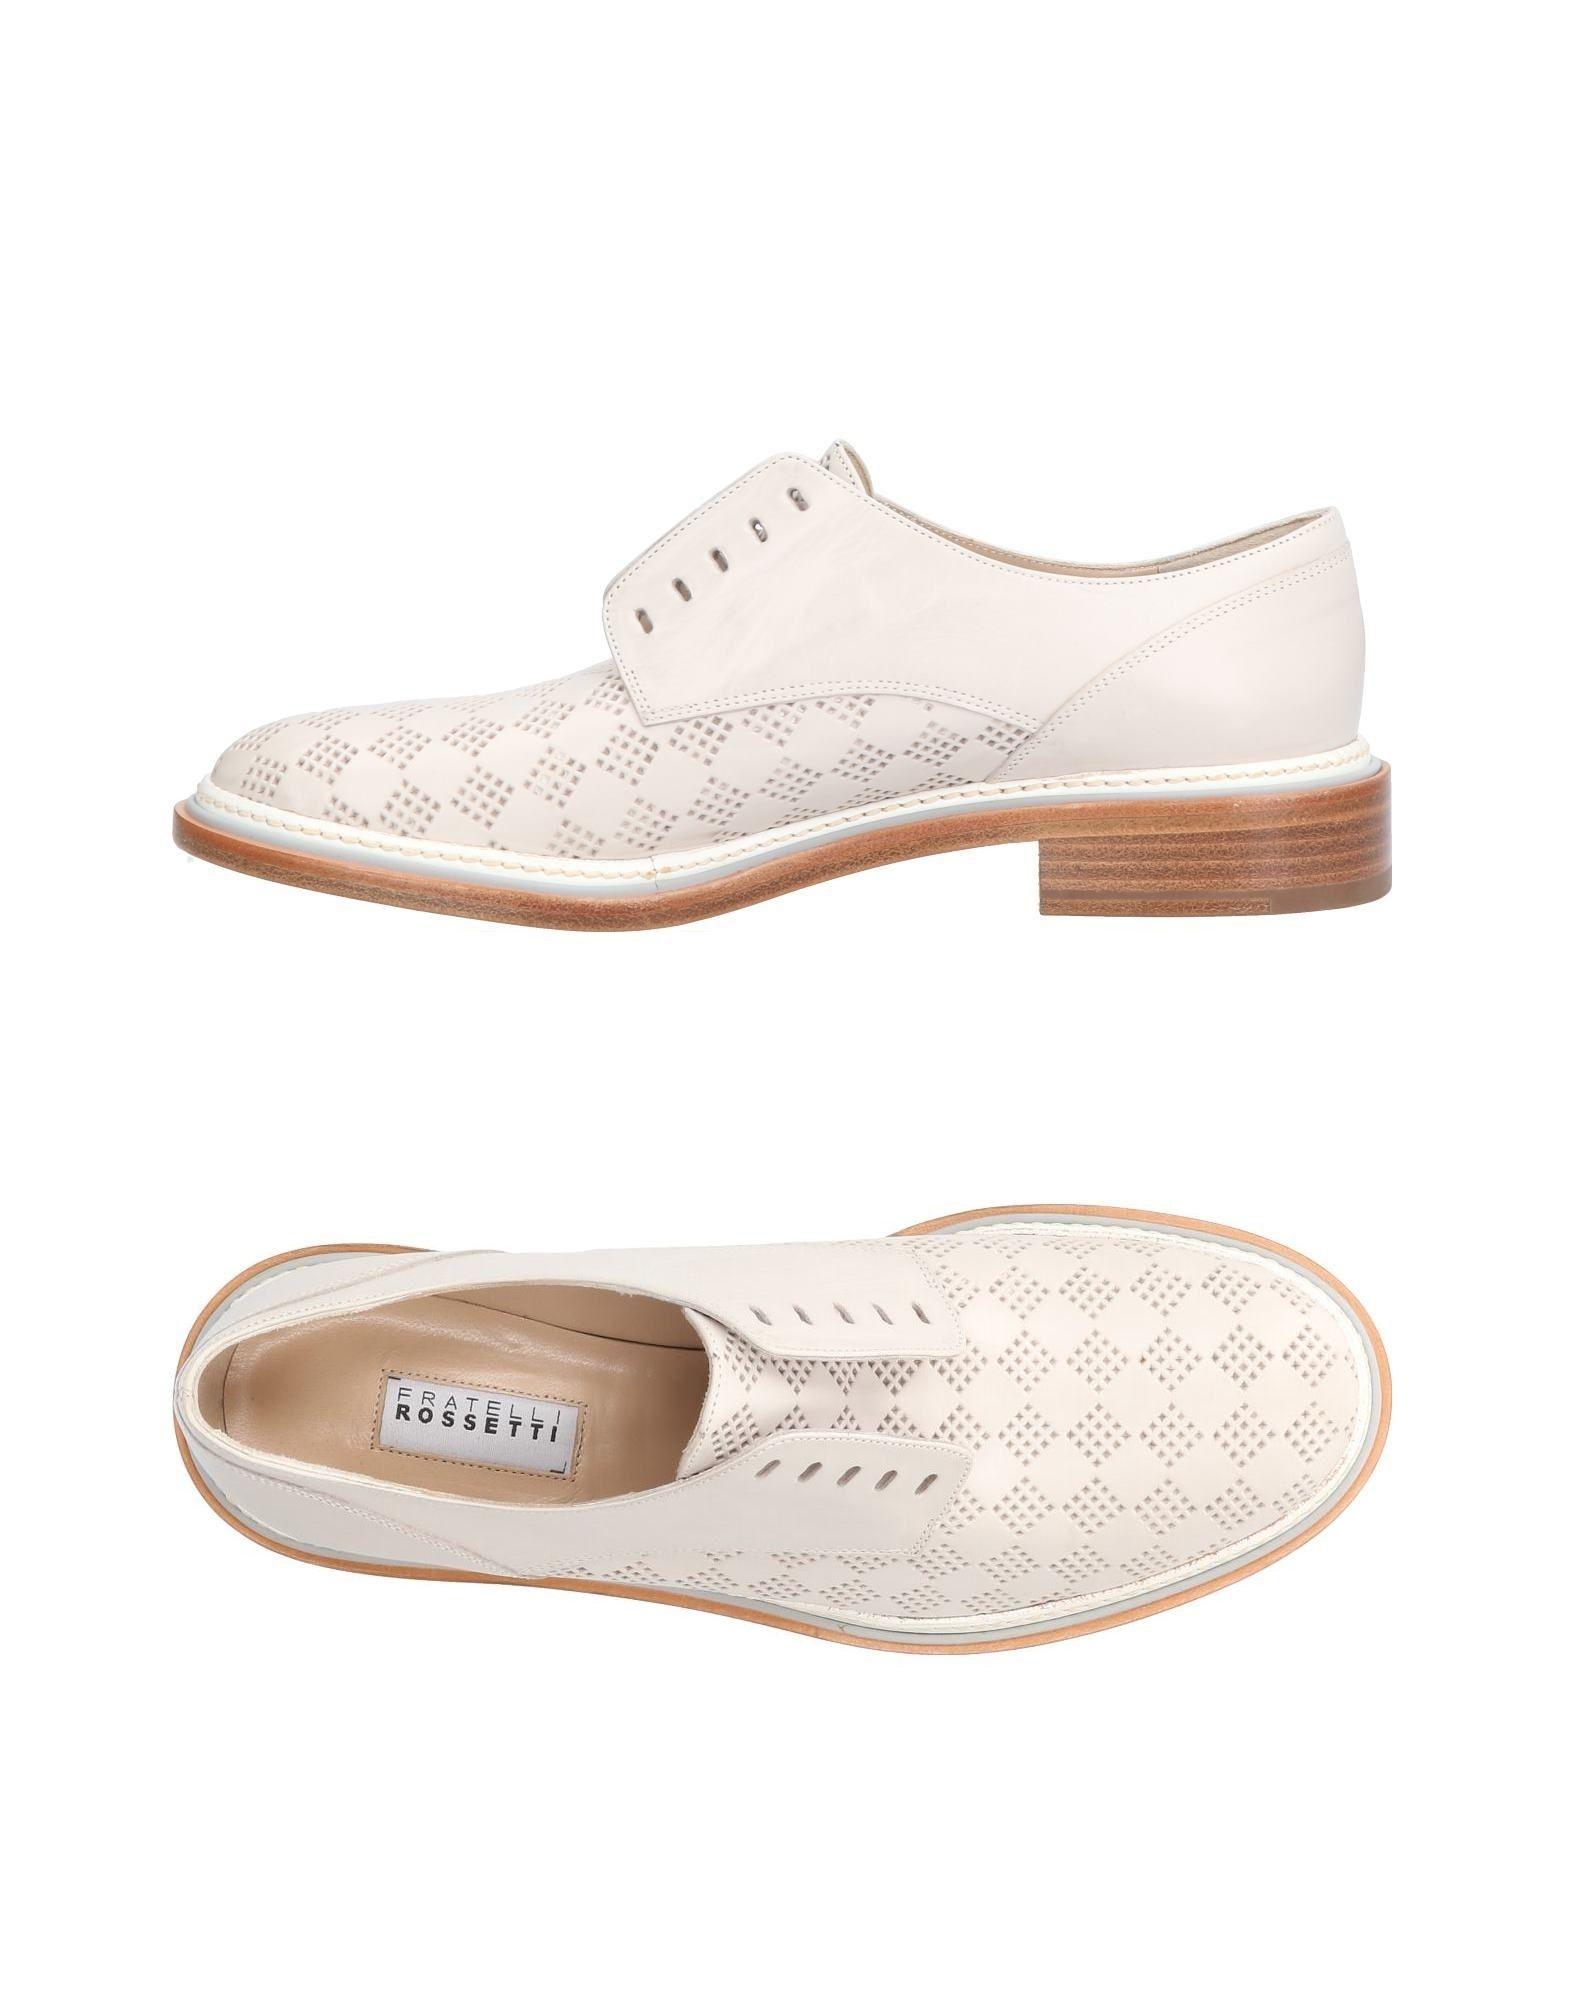 Fratelli Rossetti Schnürschuhe Damen  11440663QHGut aussehende strapazierfähige Schuhe